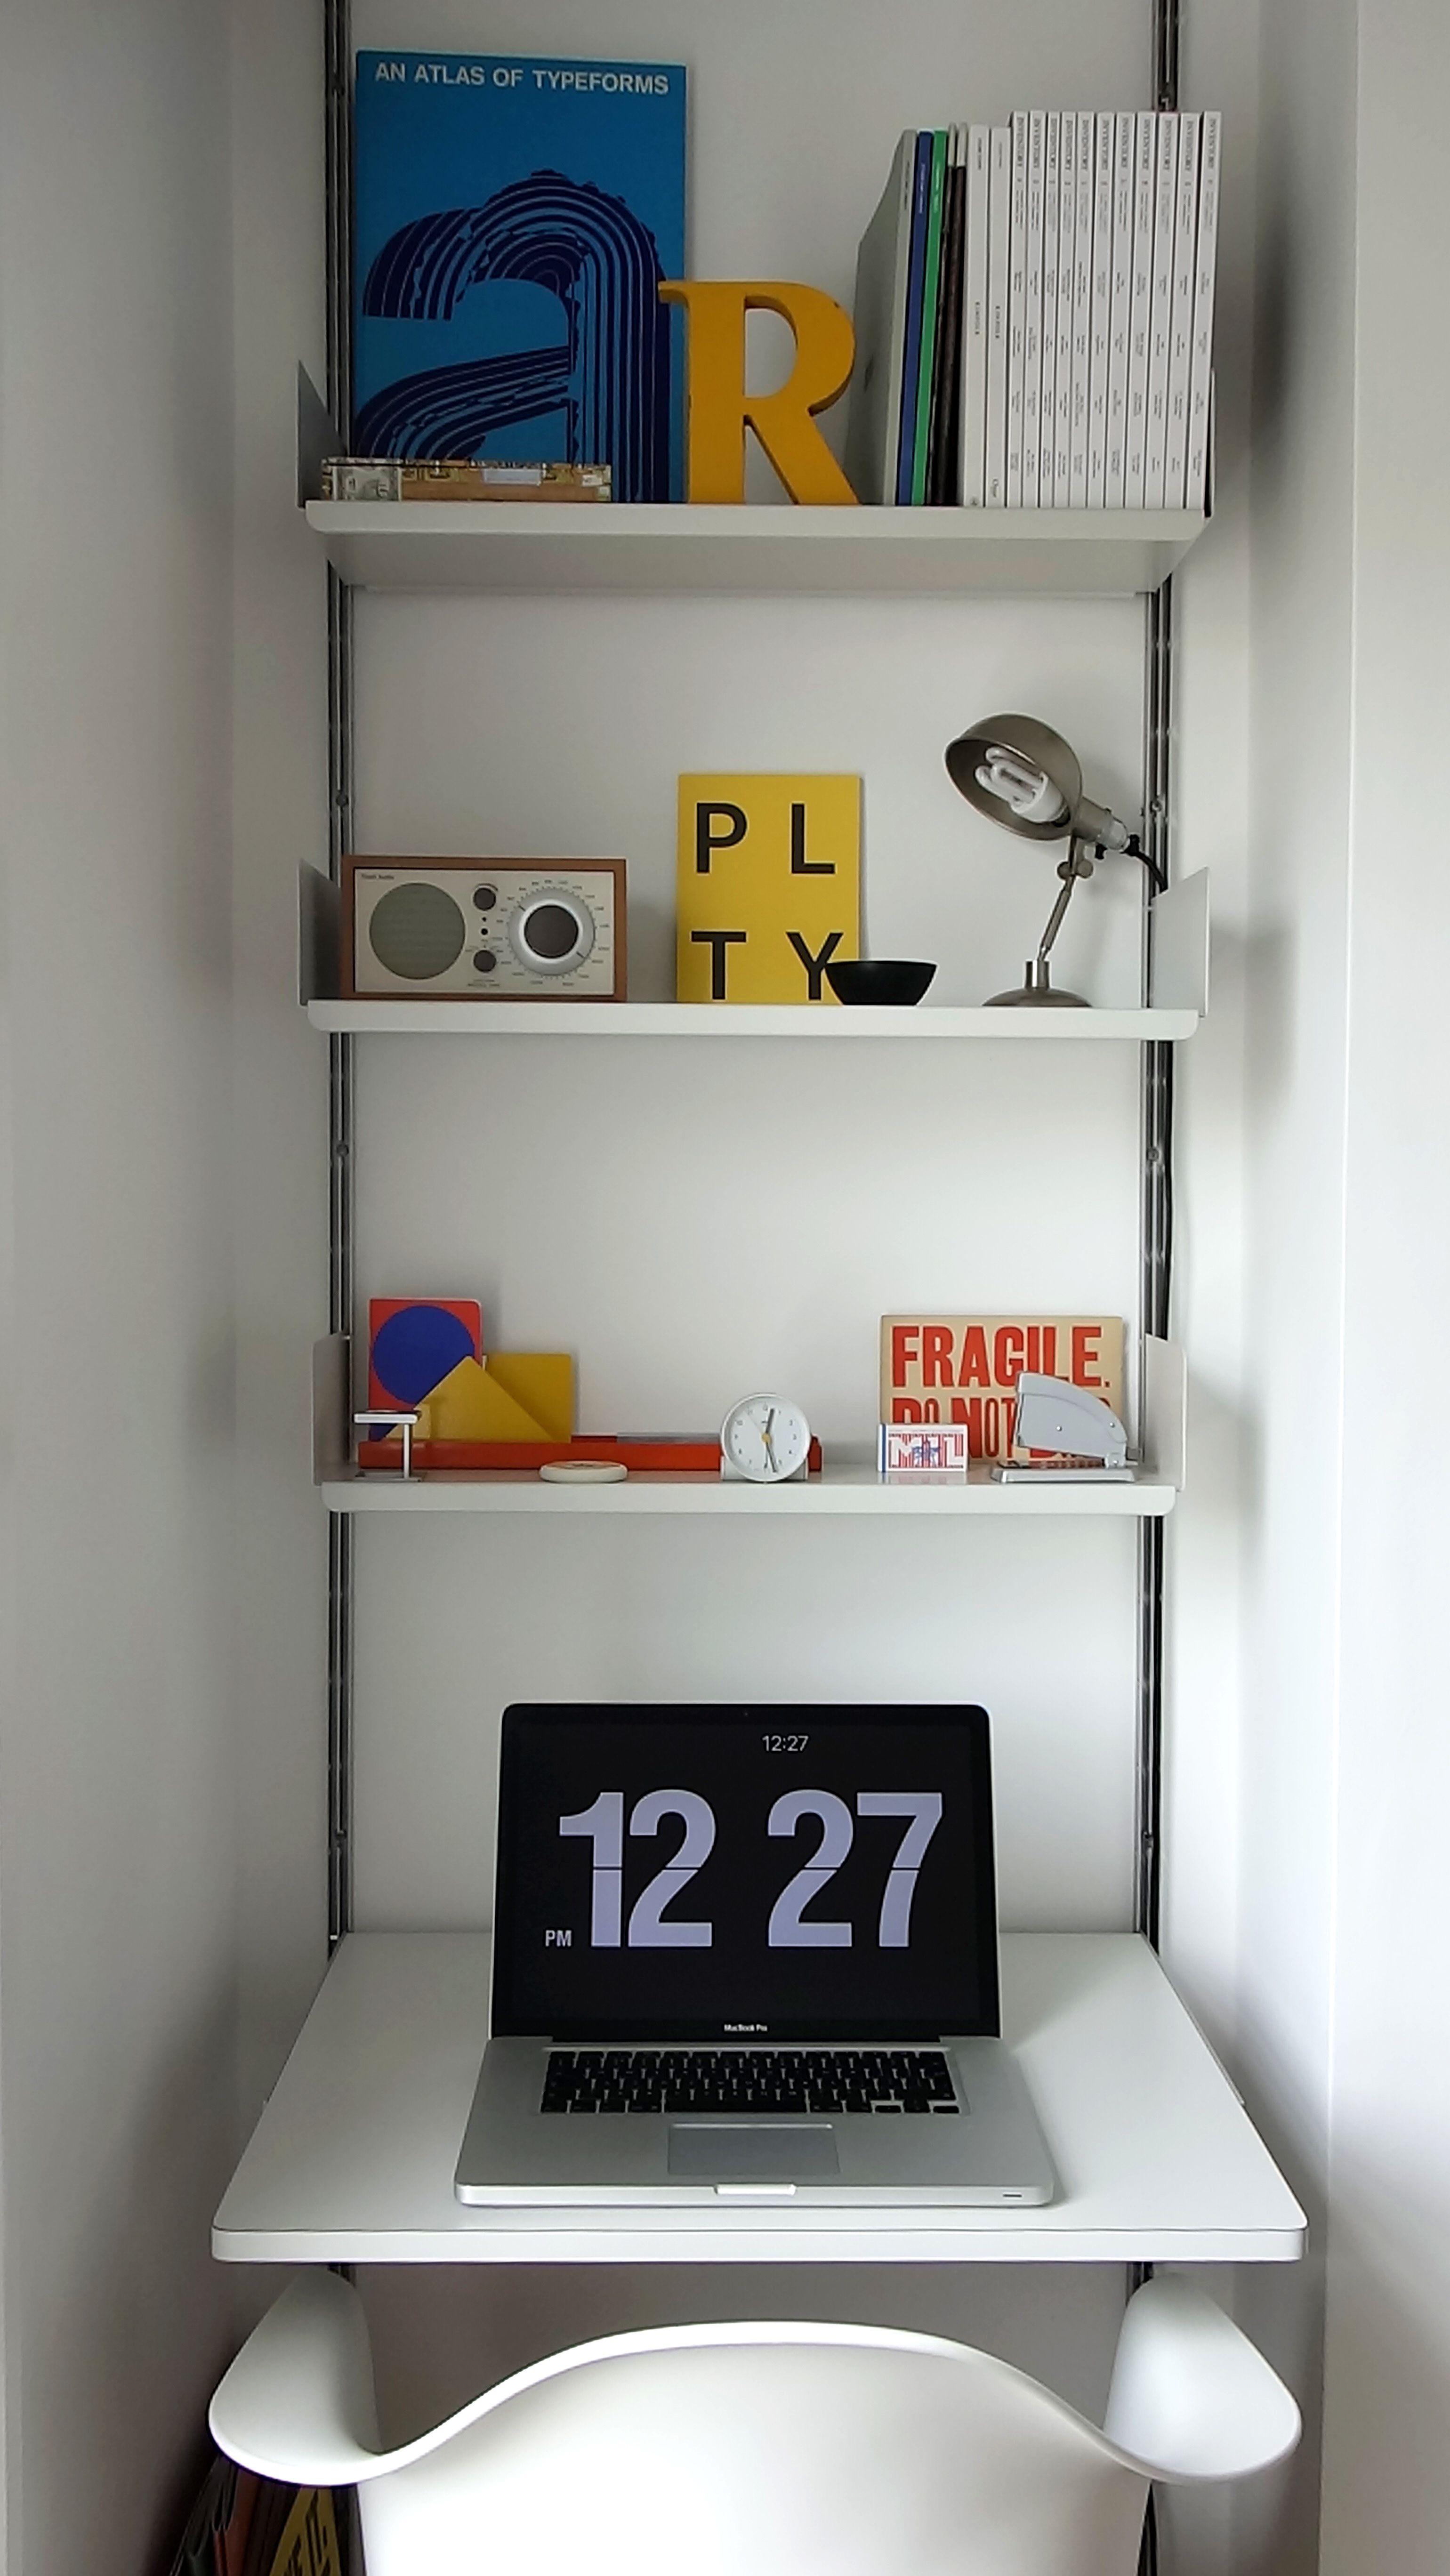 Vitsoe 606 shelving | Ideas for the House | Pinterest | Shelving ...